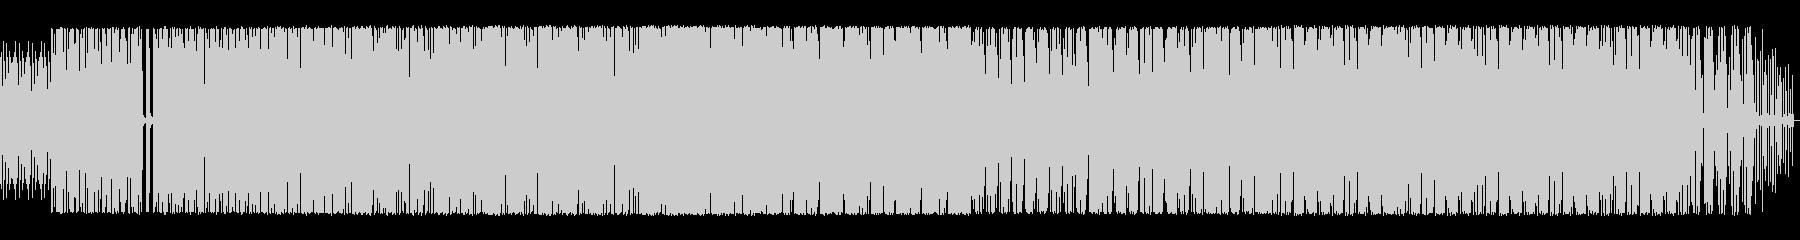 BGM用ハウスミュージックの未再生の波形